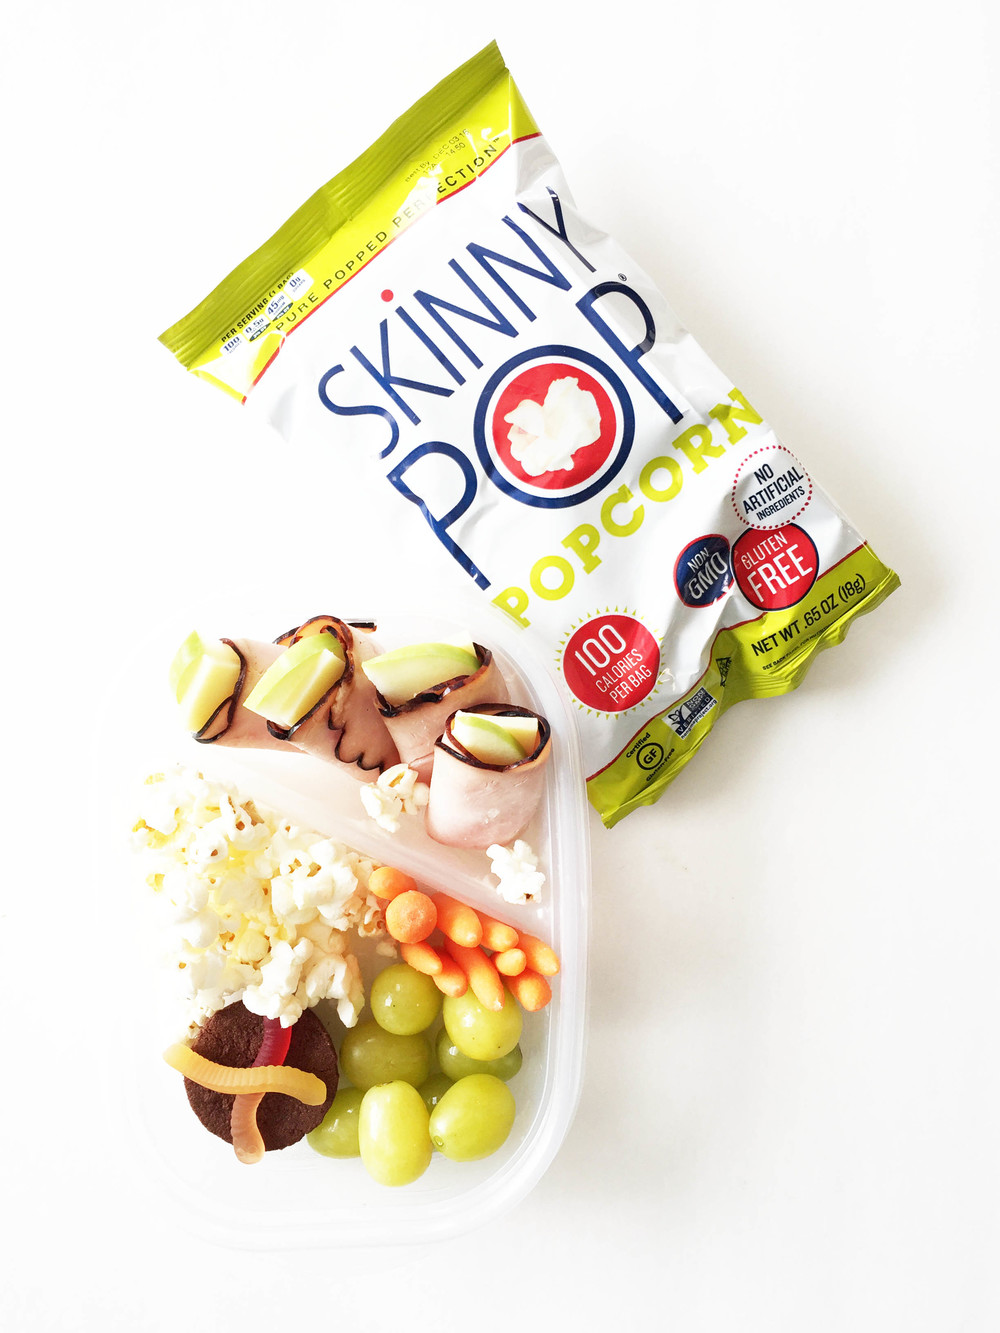 popcorn-lunchbox.jpg